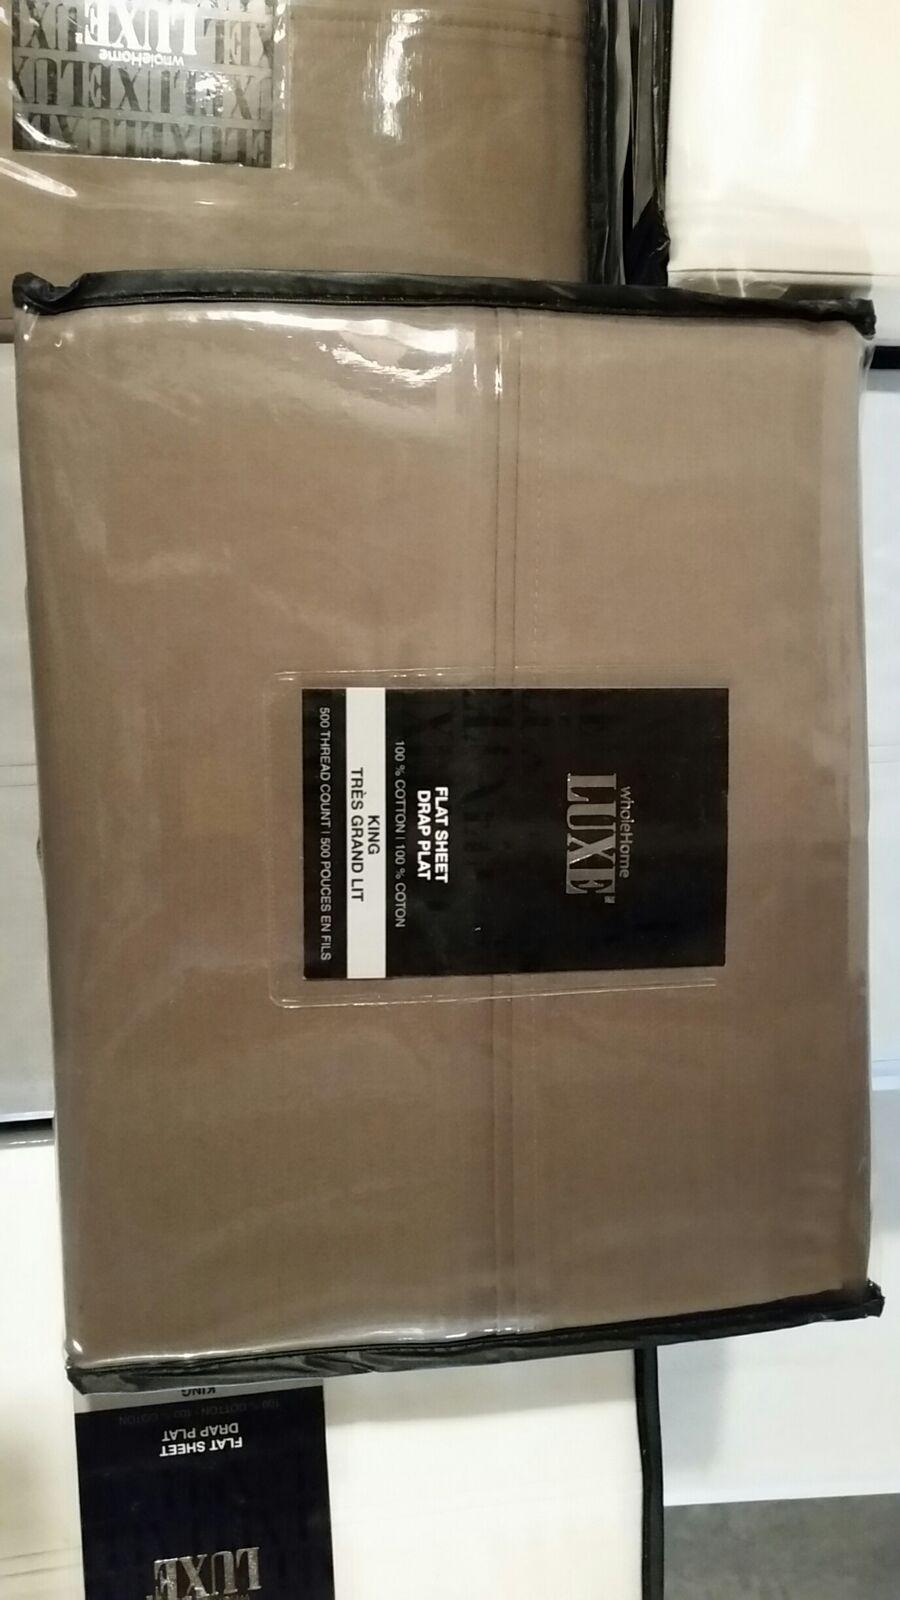 NEW - King Flat Sheet - 500 Thread 100% Egyptian Cotton Shitake Mushroom Brown